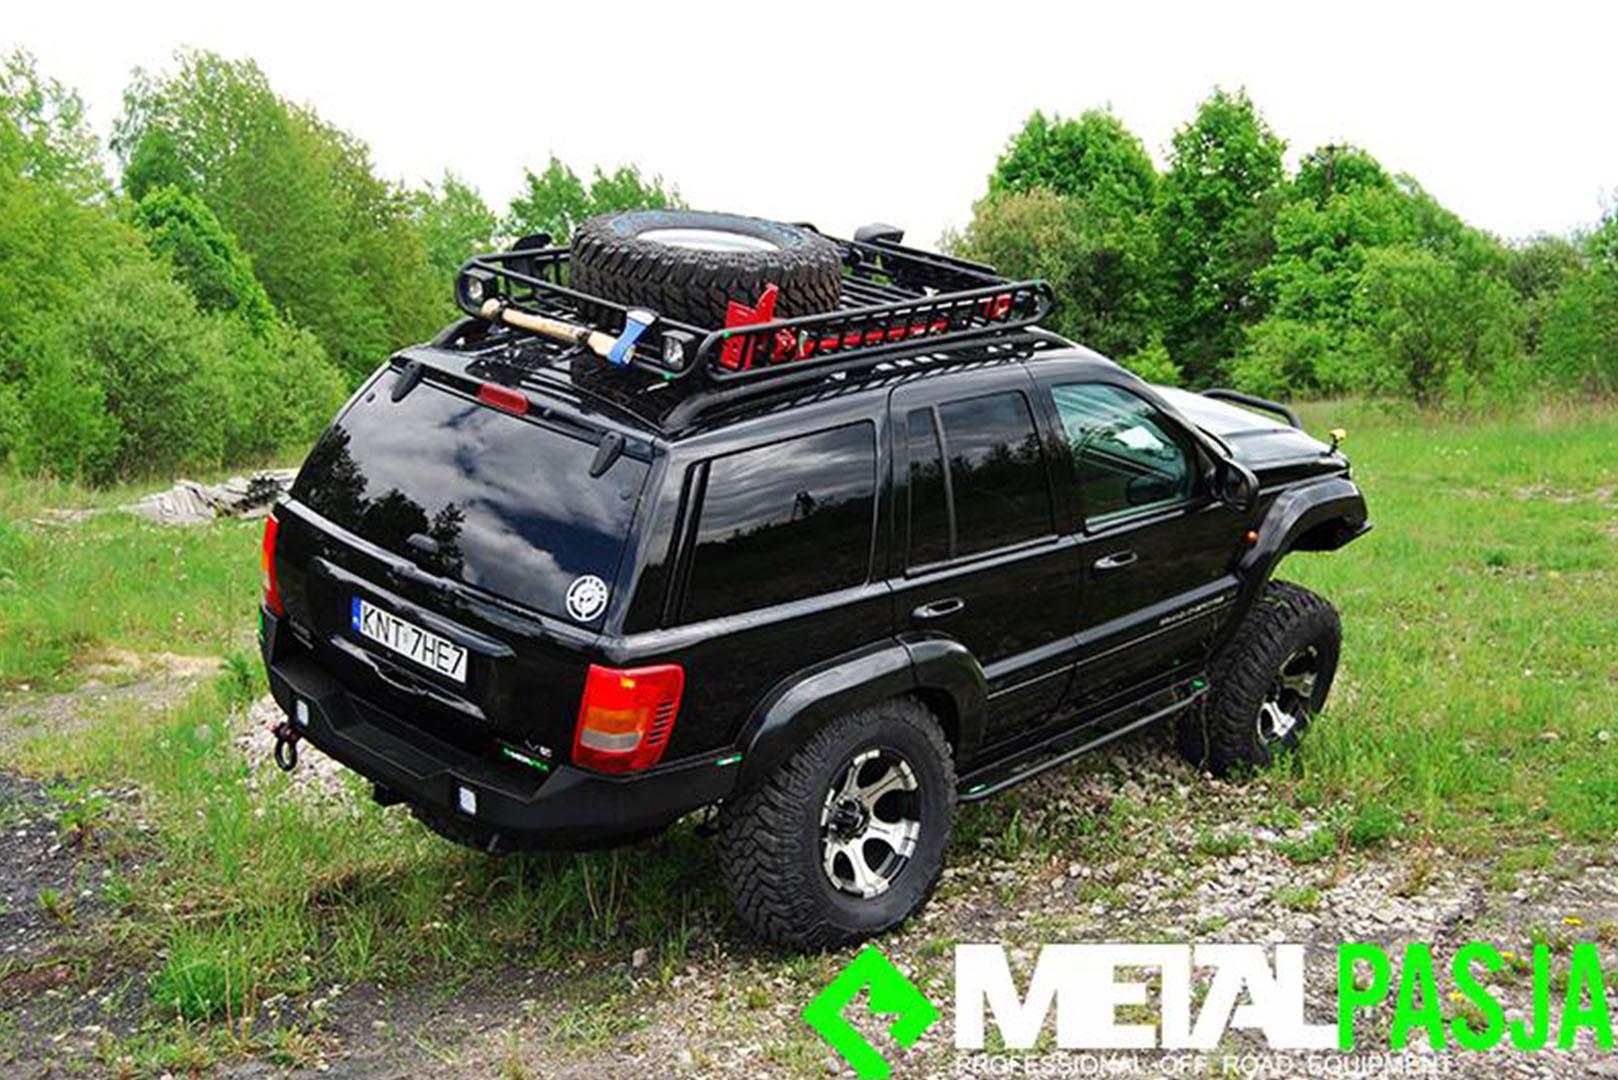 2016 Jeep Grand Cherokee Off Road >> Metalpasja Innowacyjne doposażenia offroad | Jeep Grand Cherokee WJ Off Road